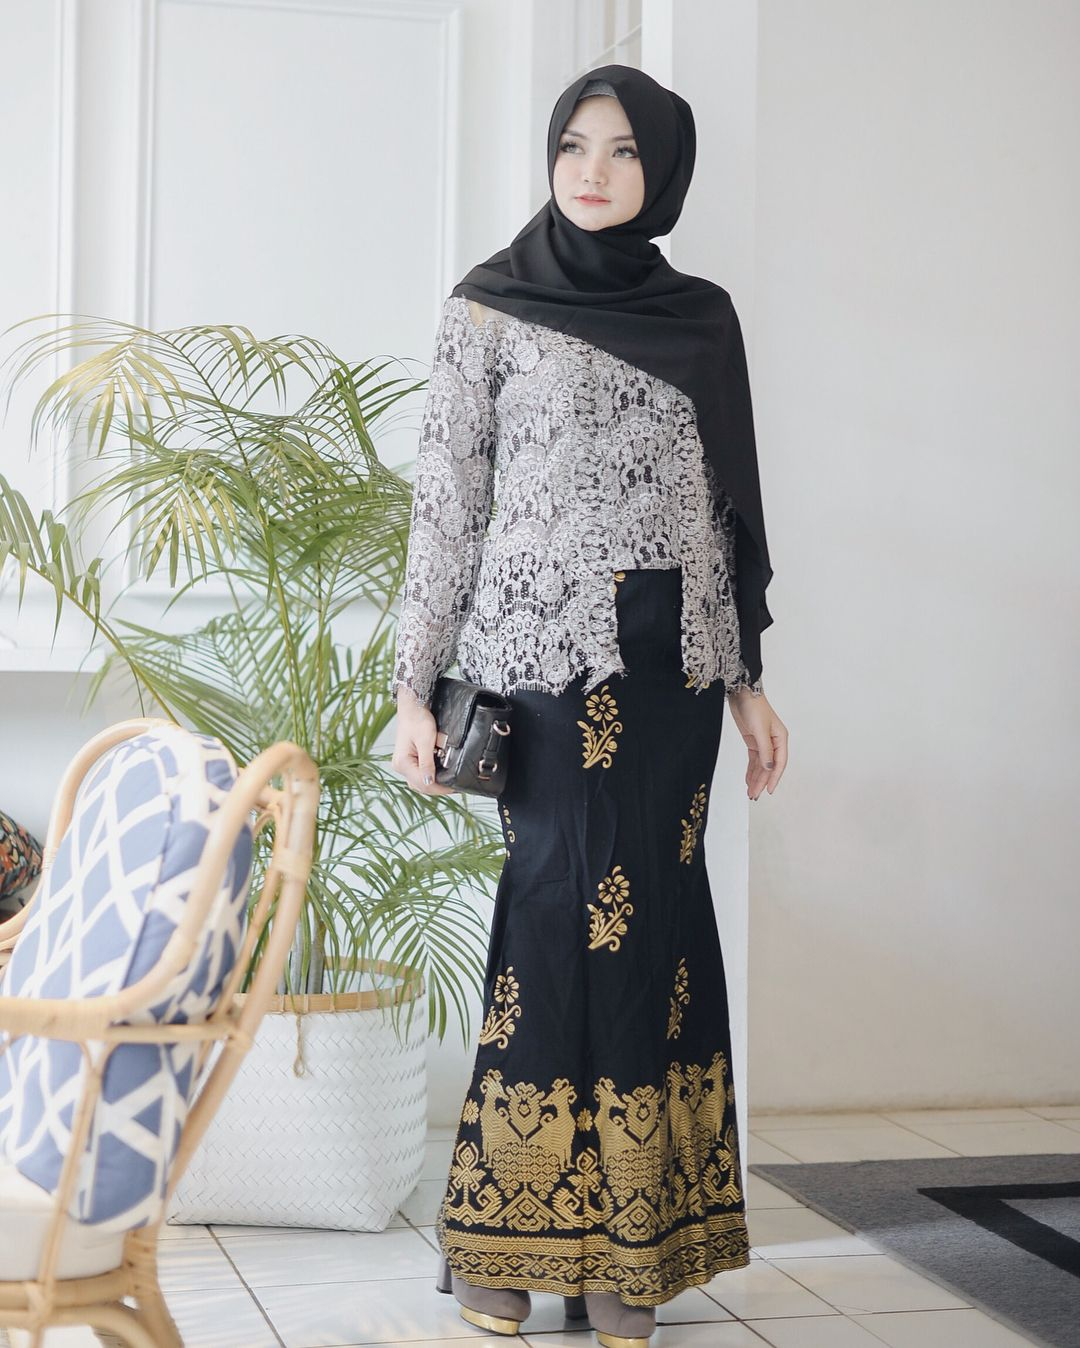 gaya hijabis #gayahijabis | hijab muslimah #hijabmuslimah ...